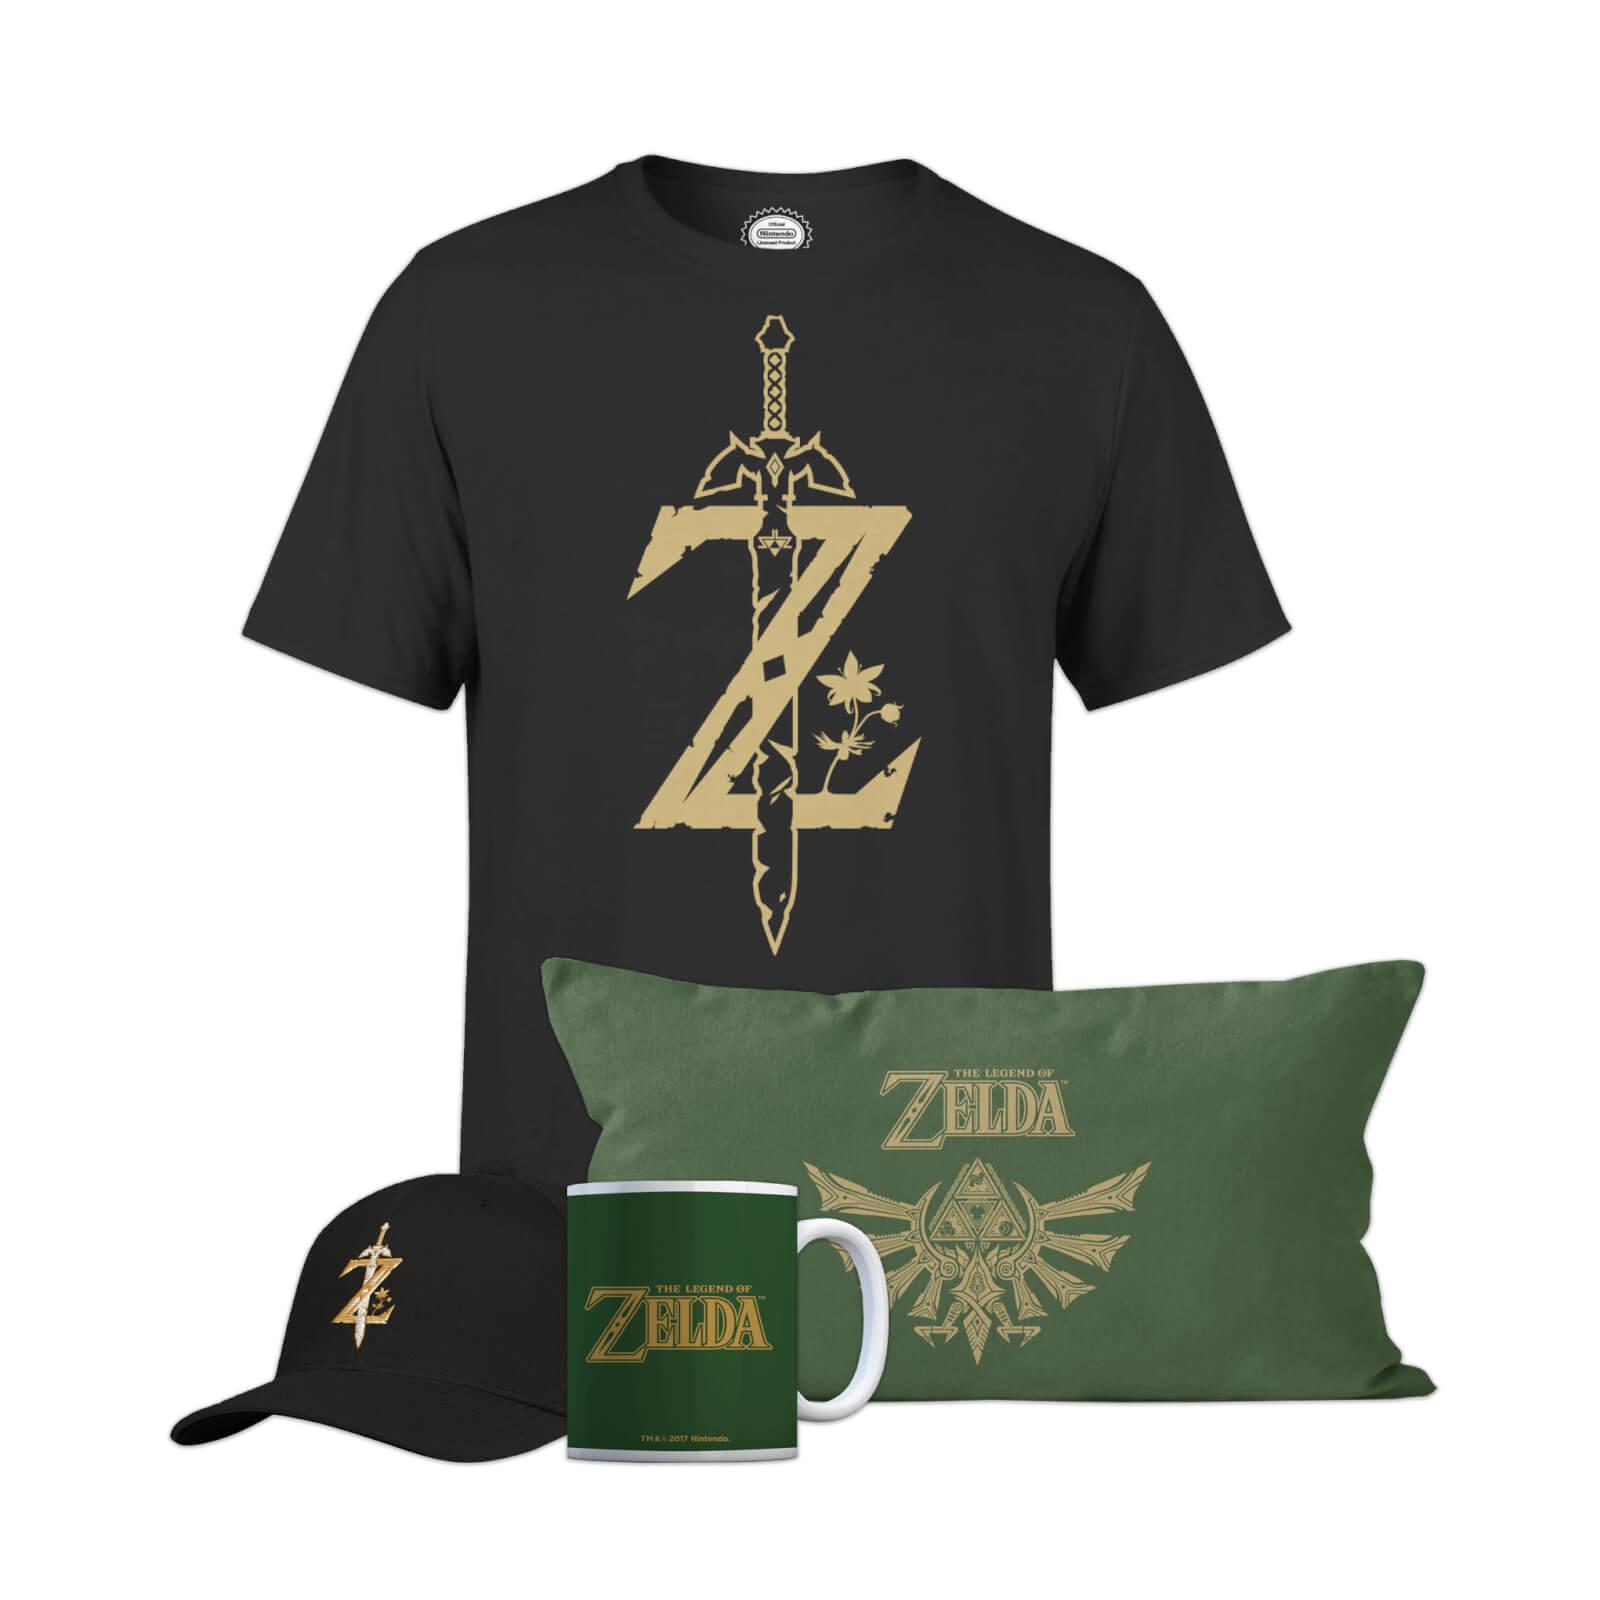 Méga Lot de goodies Nintendo The Legend Of Zelda : T-shirt + Coussin + Tasse + Casquette